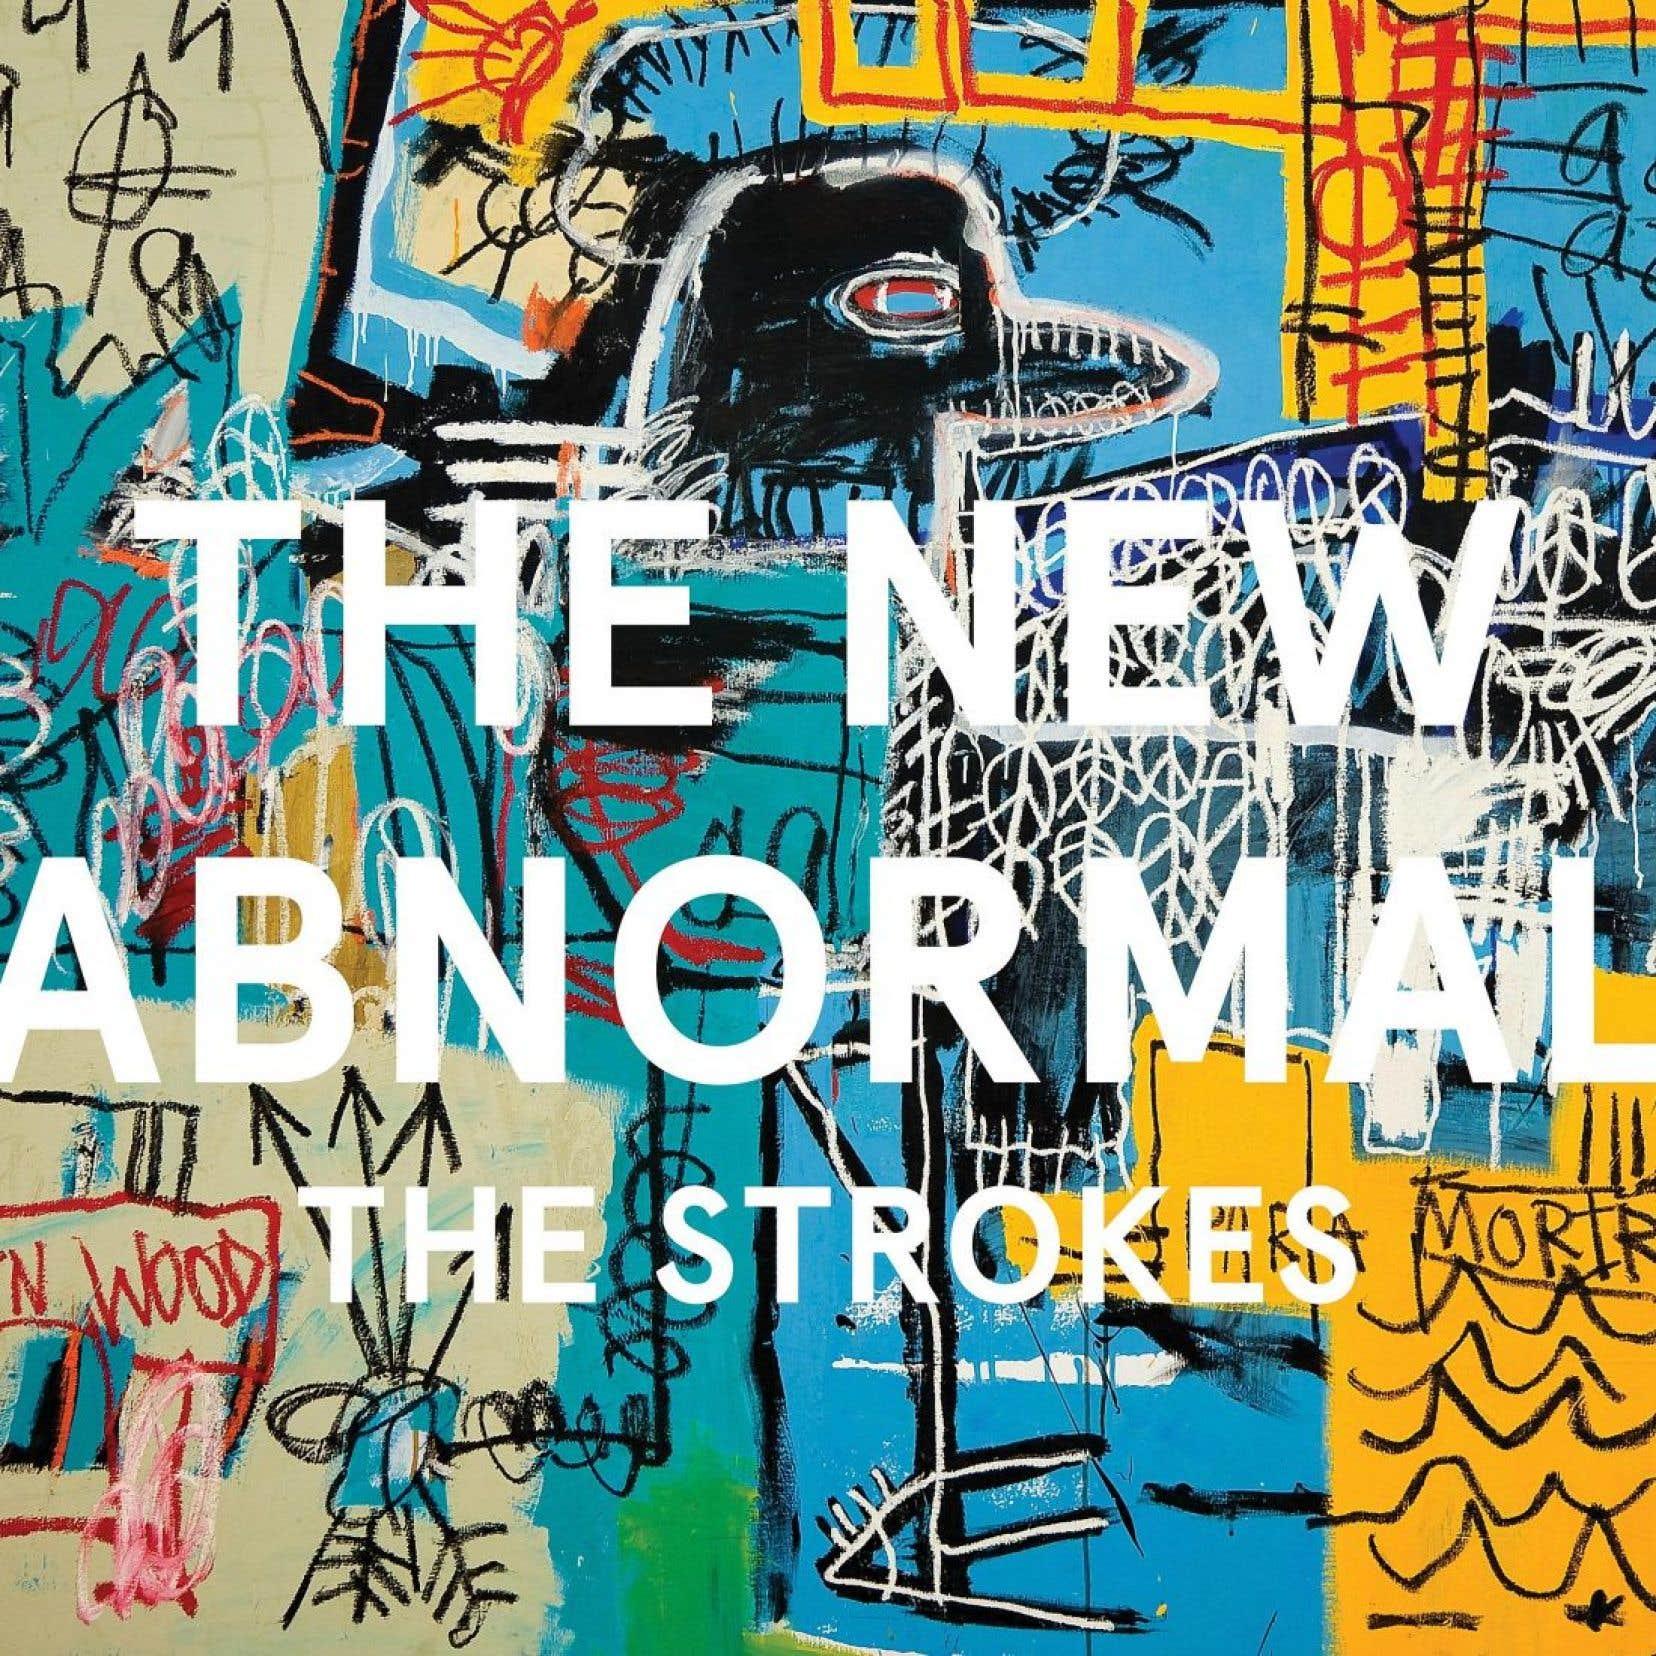 The New Abnormal, The Strokes | Le Devoir